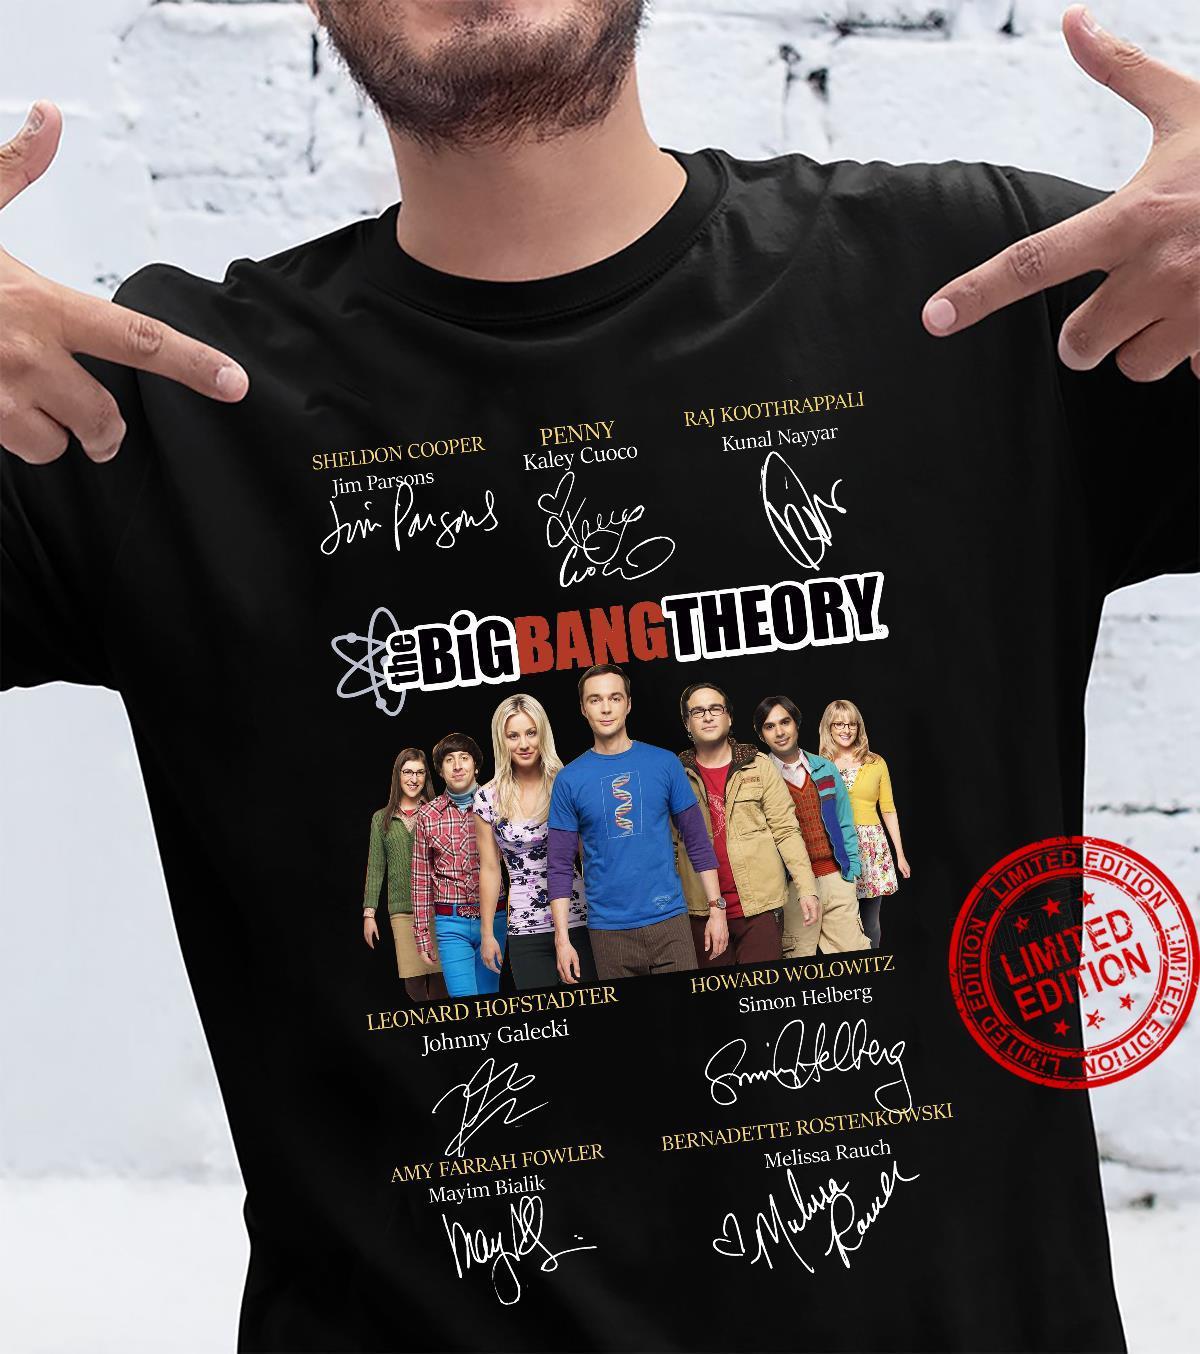 The big bang theory signature of Sheldon Cooper Penny Raj Koothrappali shirt